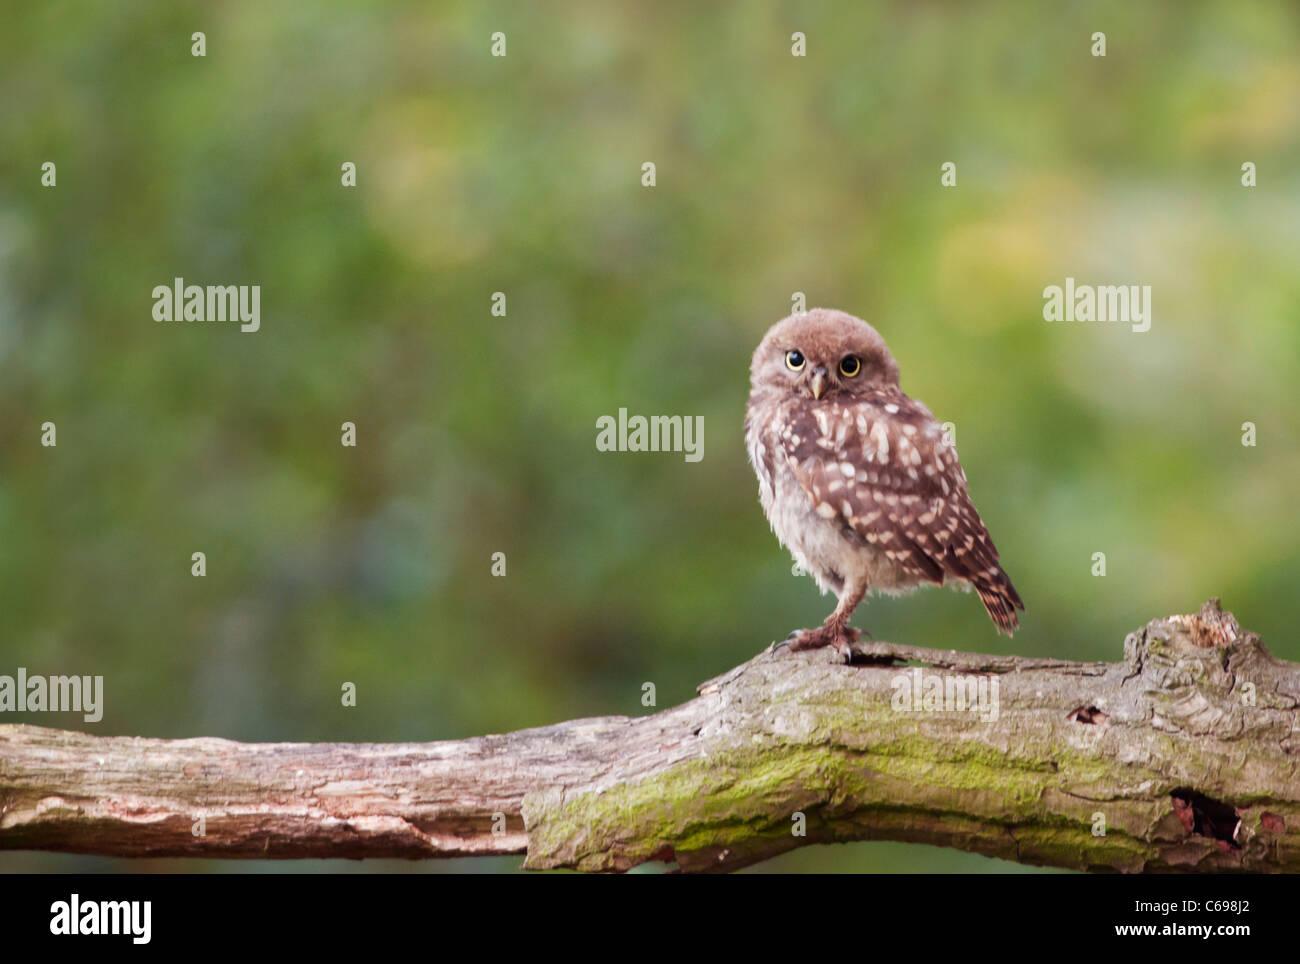 Juvenile Little Owl (Athene noctua) perched on tree branch - Stock Image